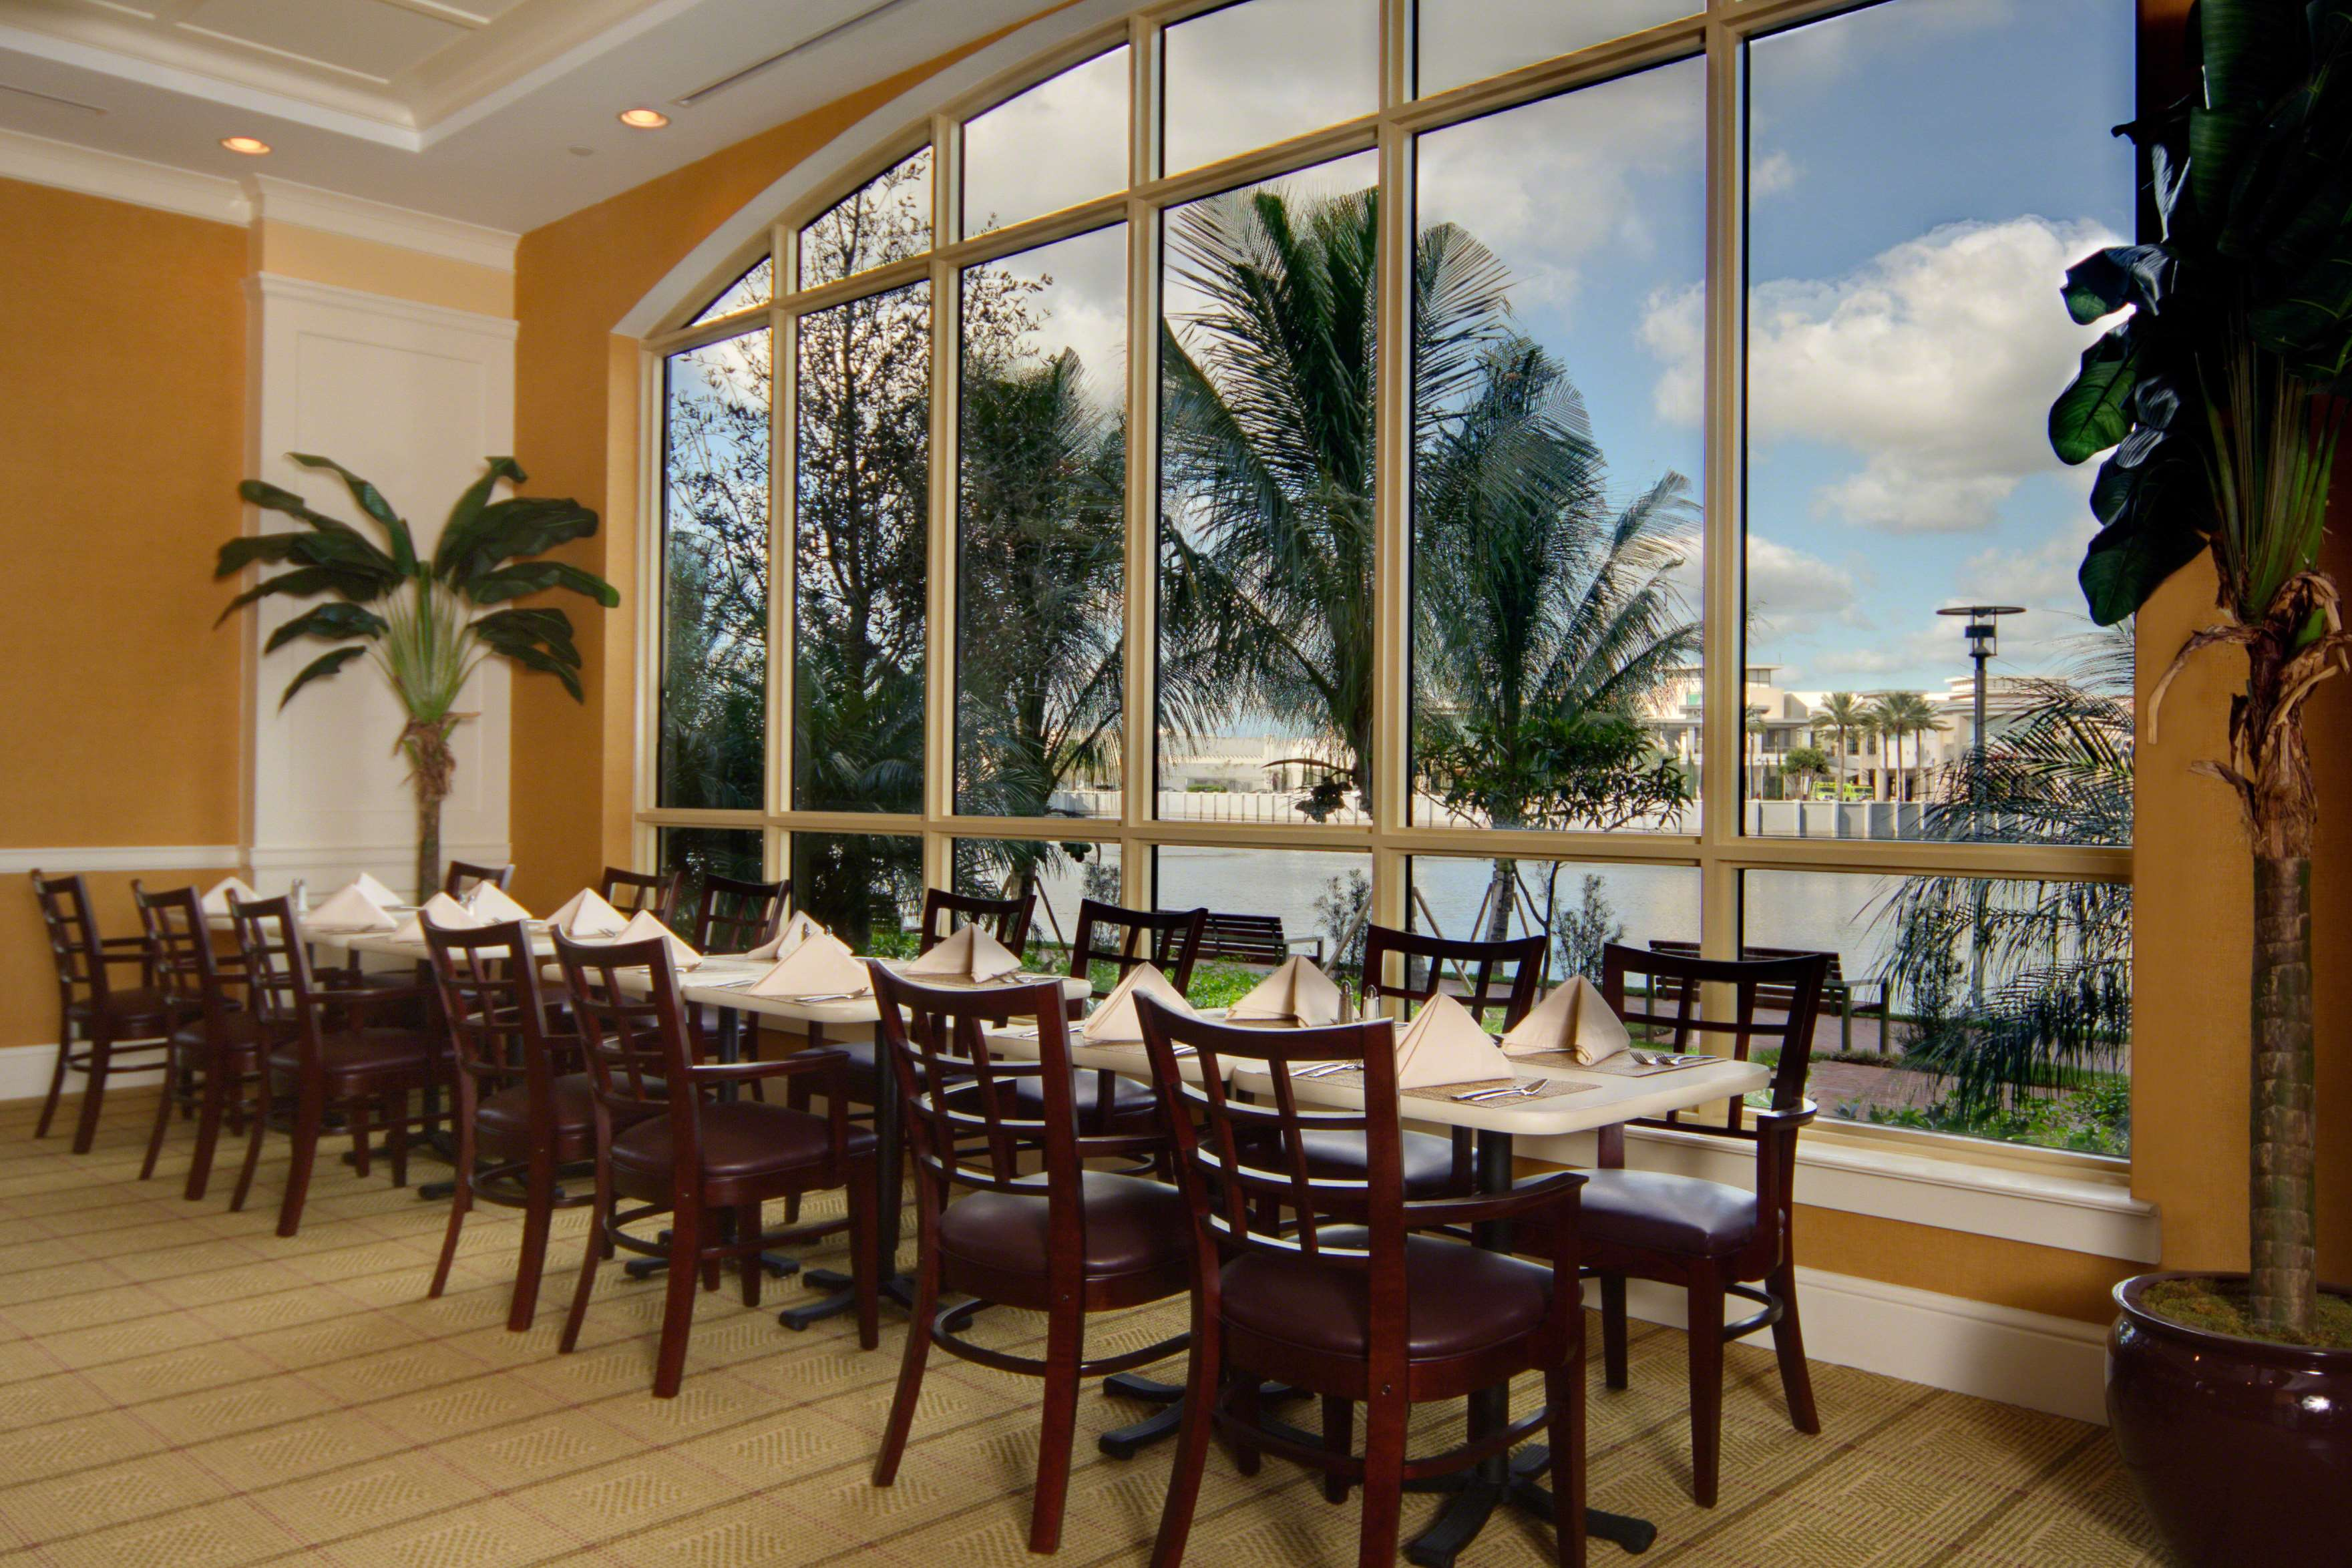 Hilton Garden Inn Palm Beach Gardens image 8